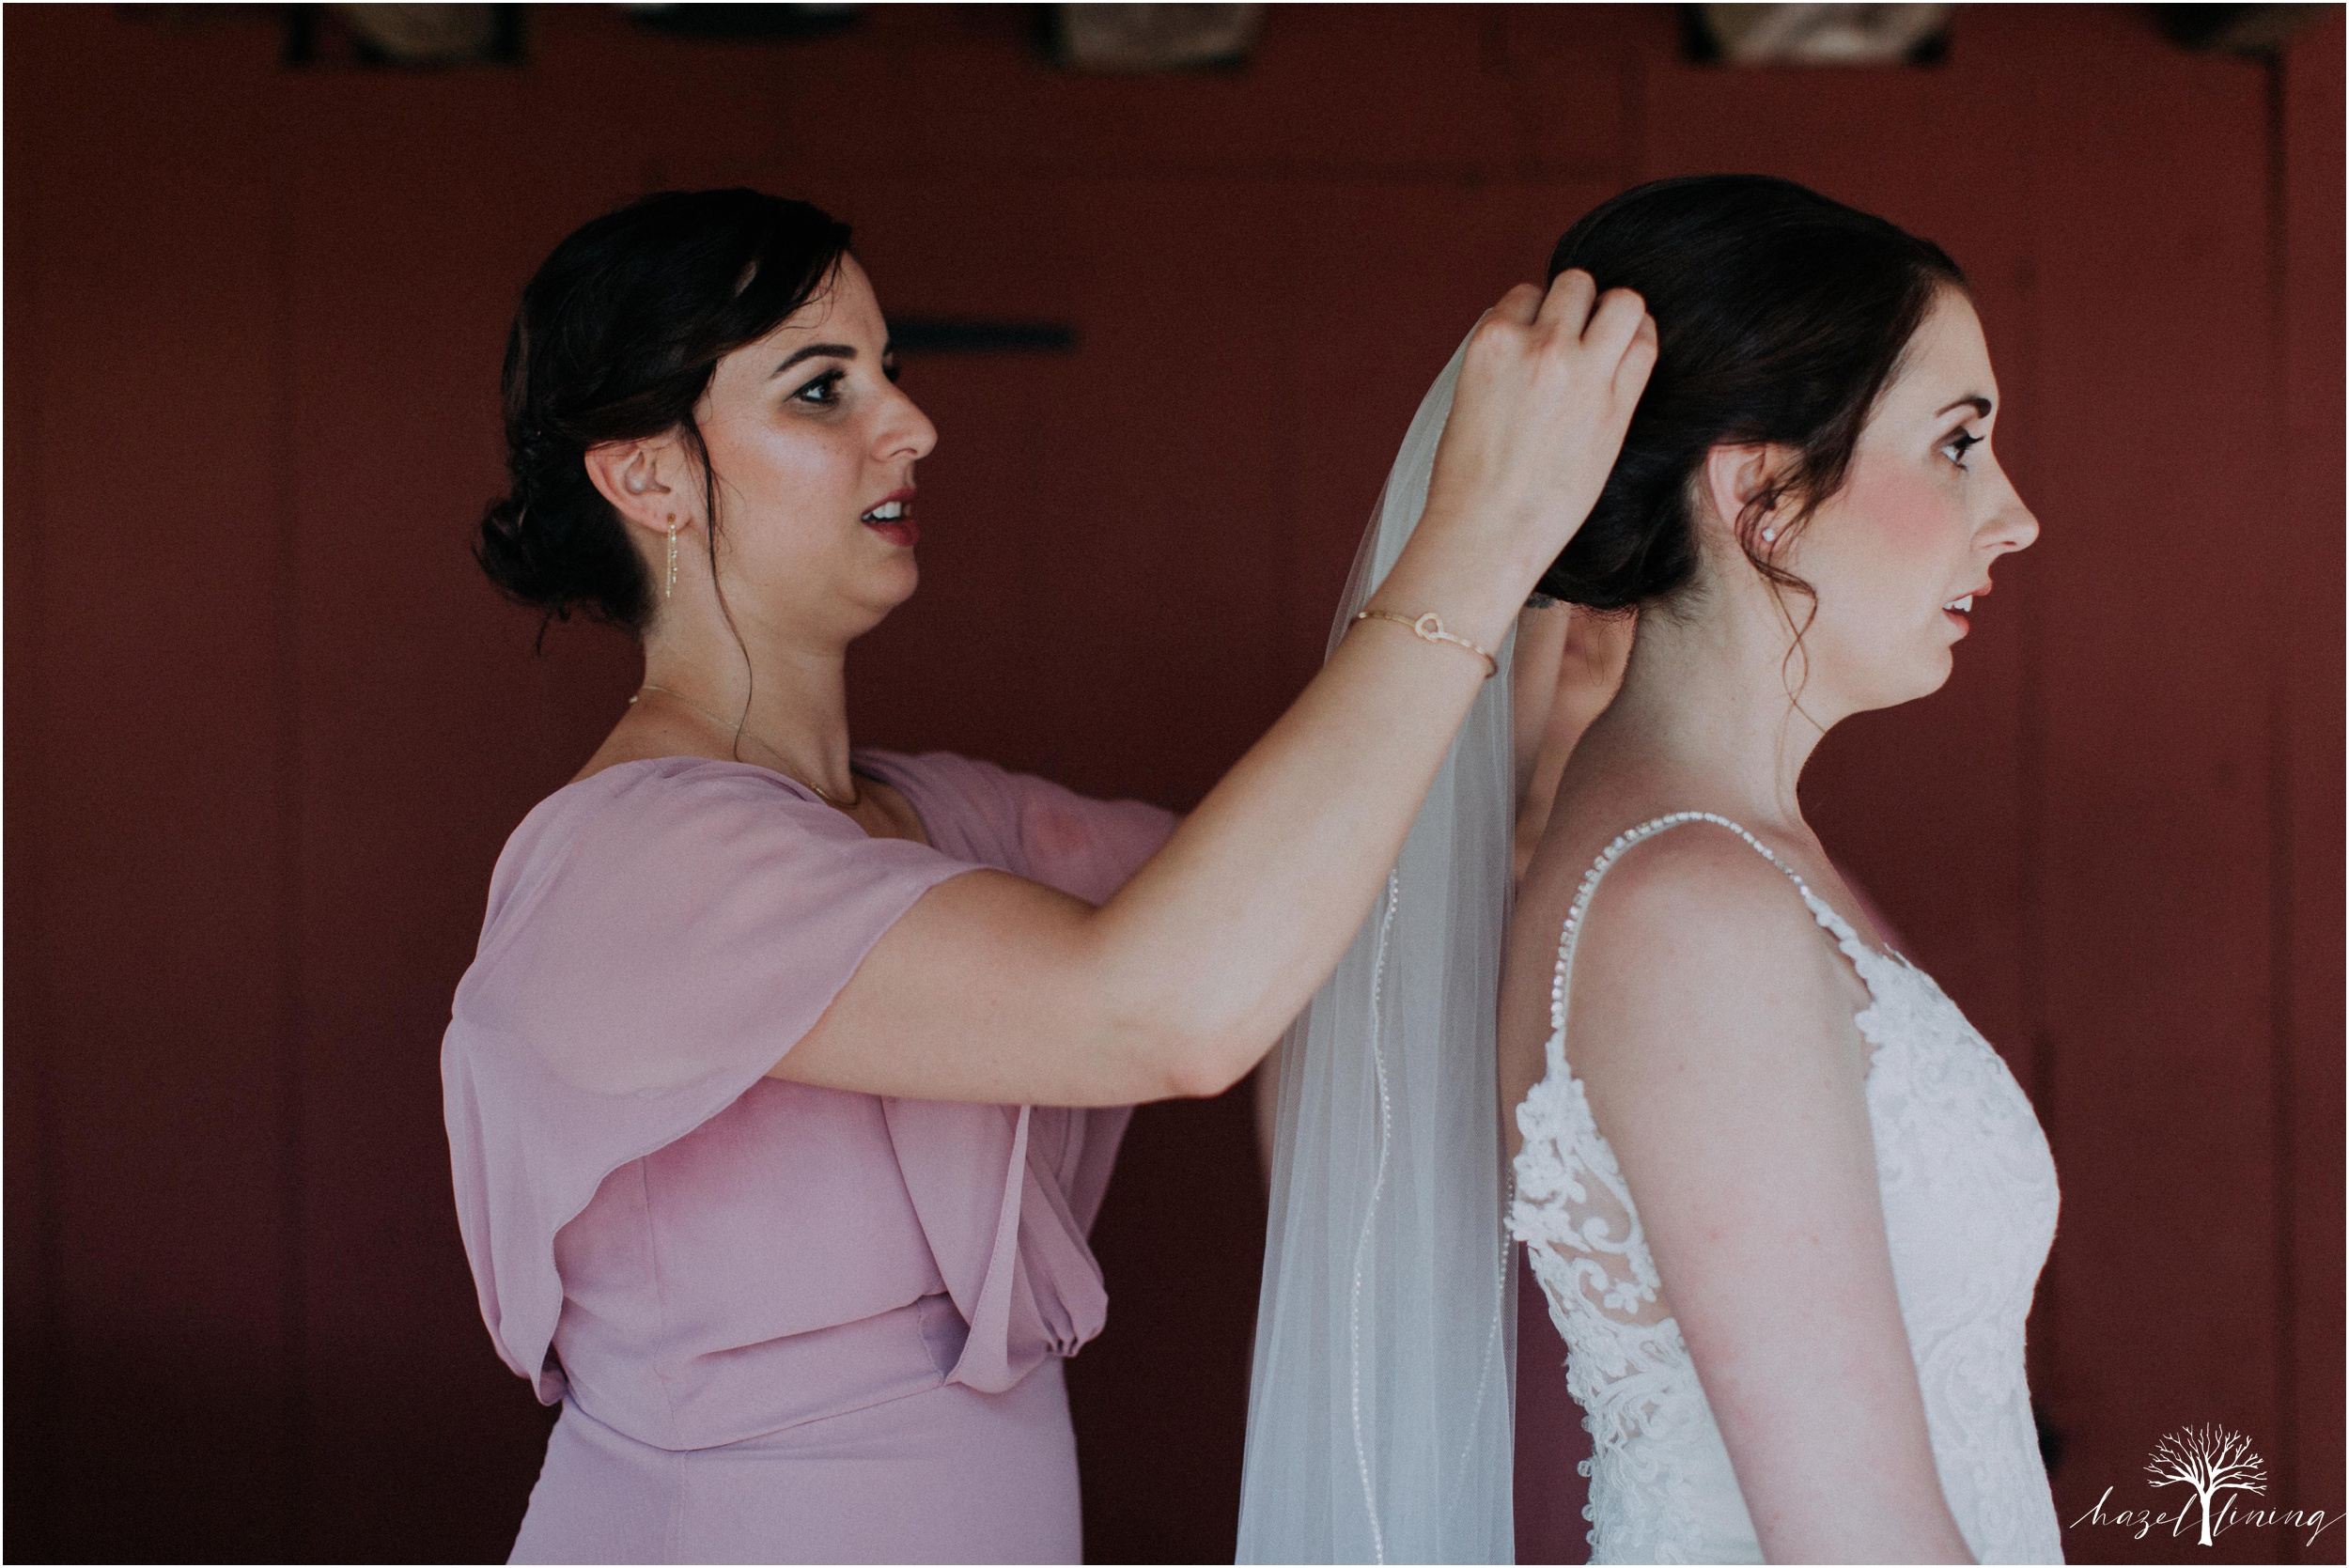 hazel-lining-travel-wedding-elopement-photography-lisa-landon-shoemaker-the-farm-bakery-and-events-bucks-county-quakertown-pennsylvania-summer-country-outdoor-farm-wedding_0014.jpg